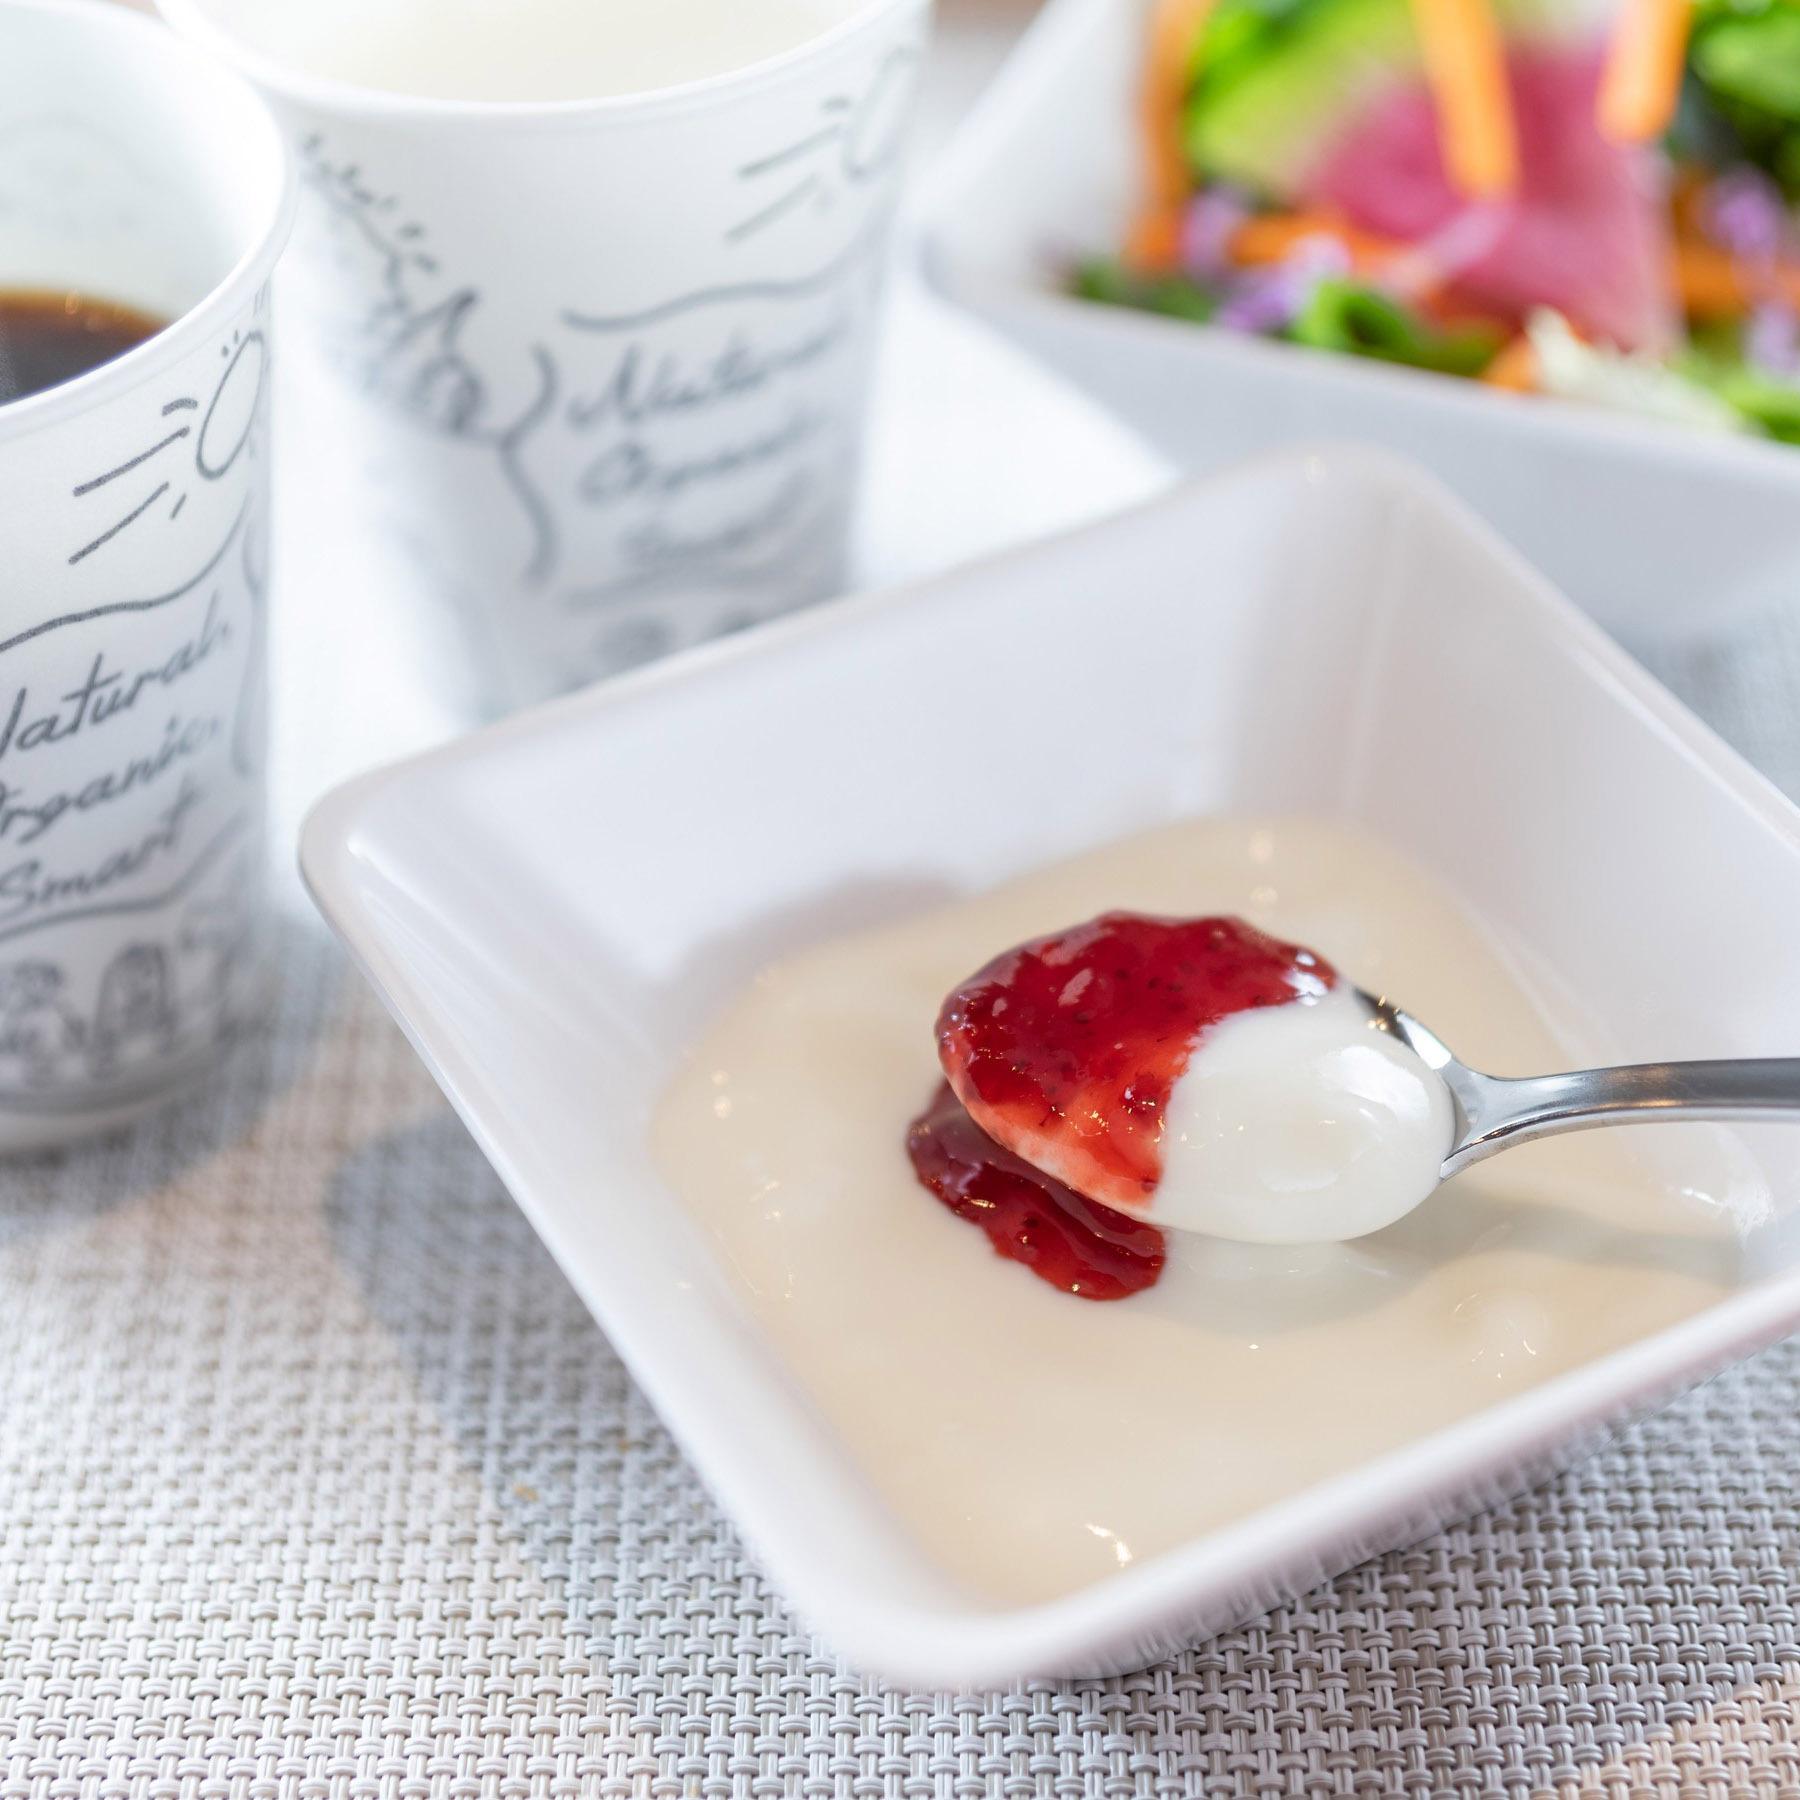 【Organic】デザートにヨーグルトをどうぞ♪